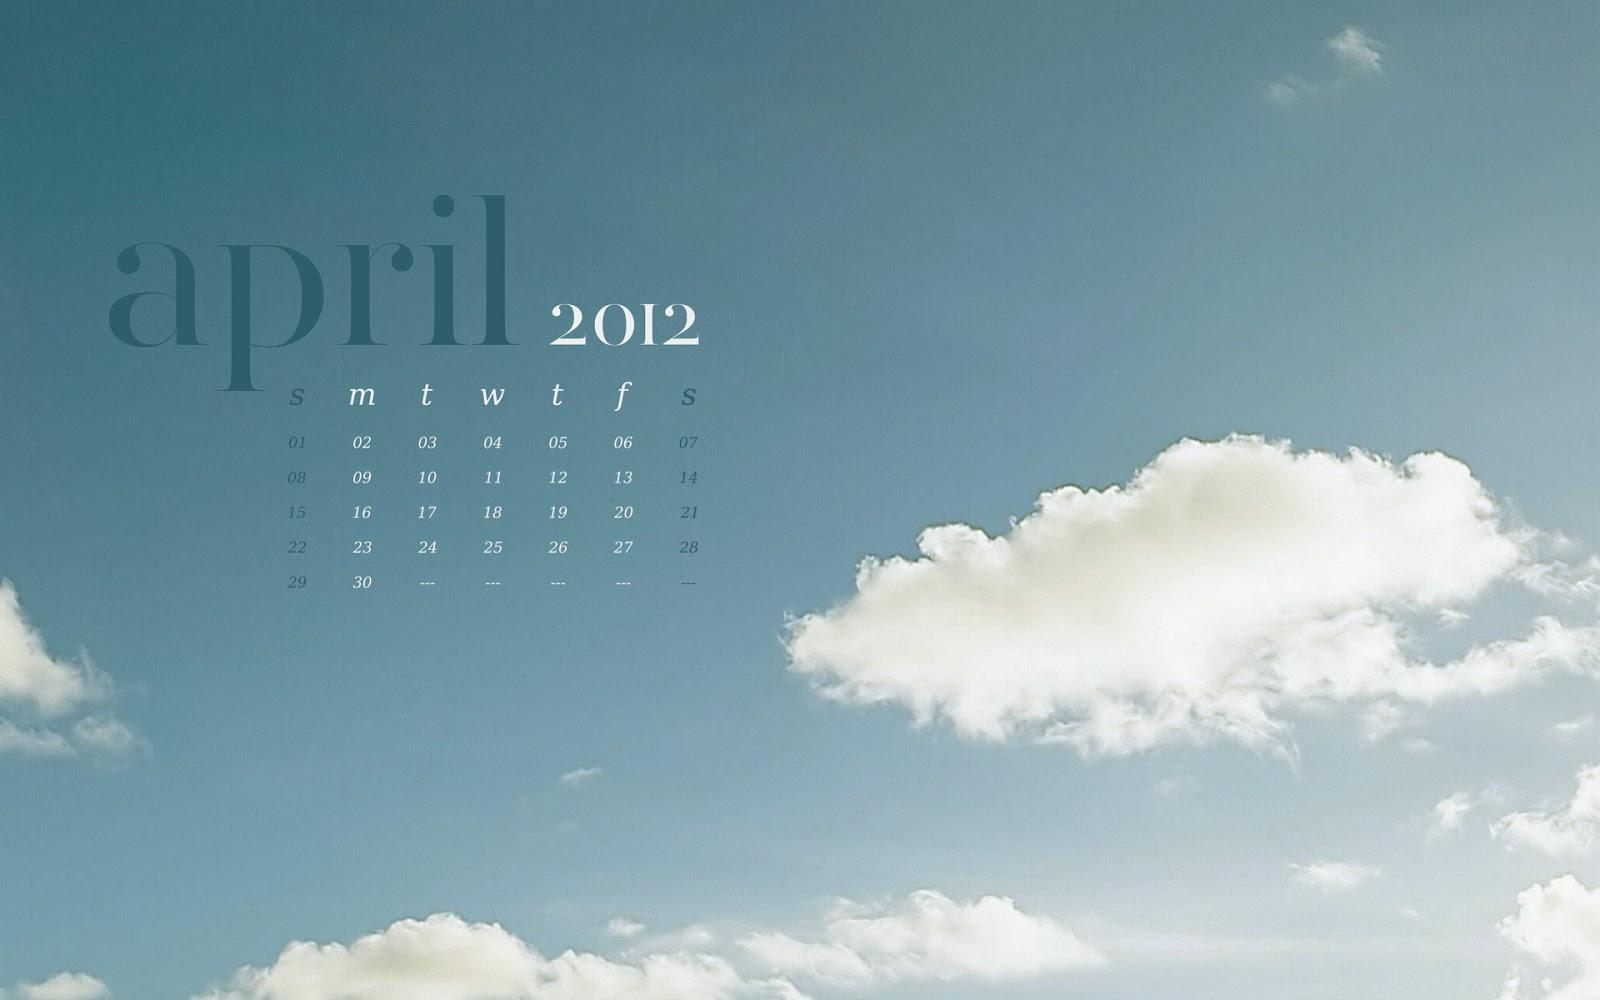 Calendar April 2012 wallpaper background skies